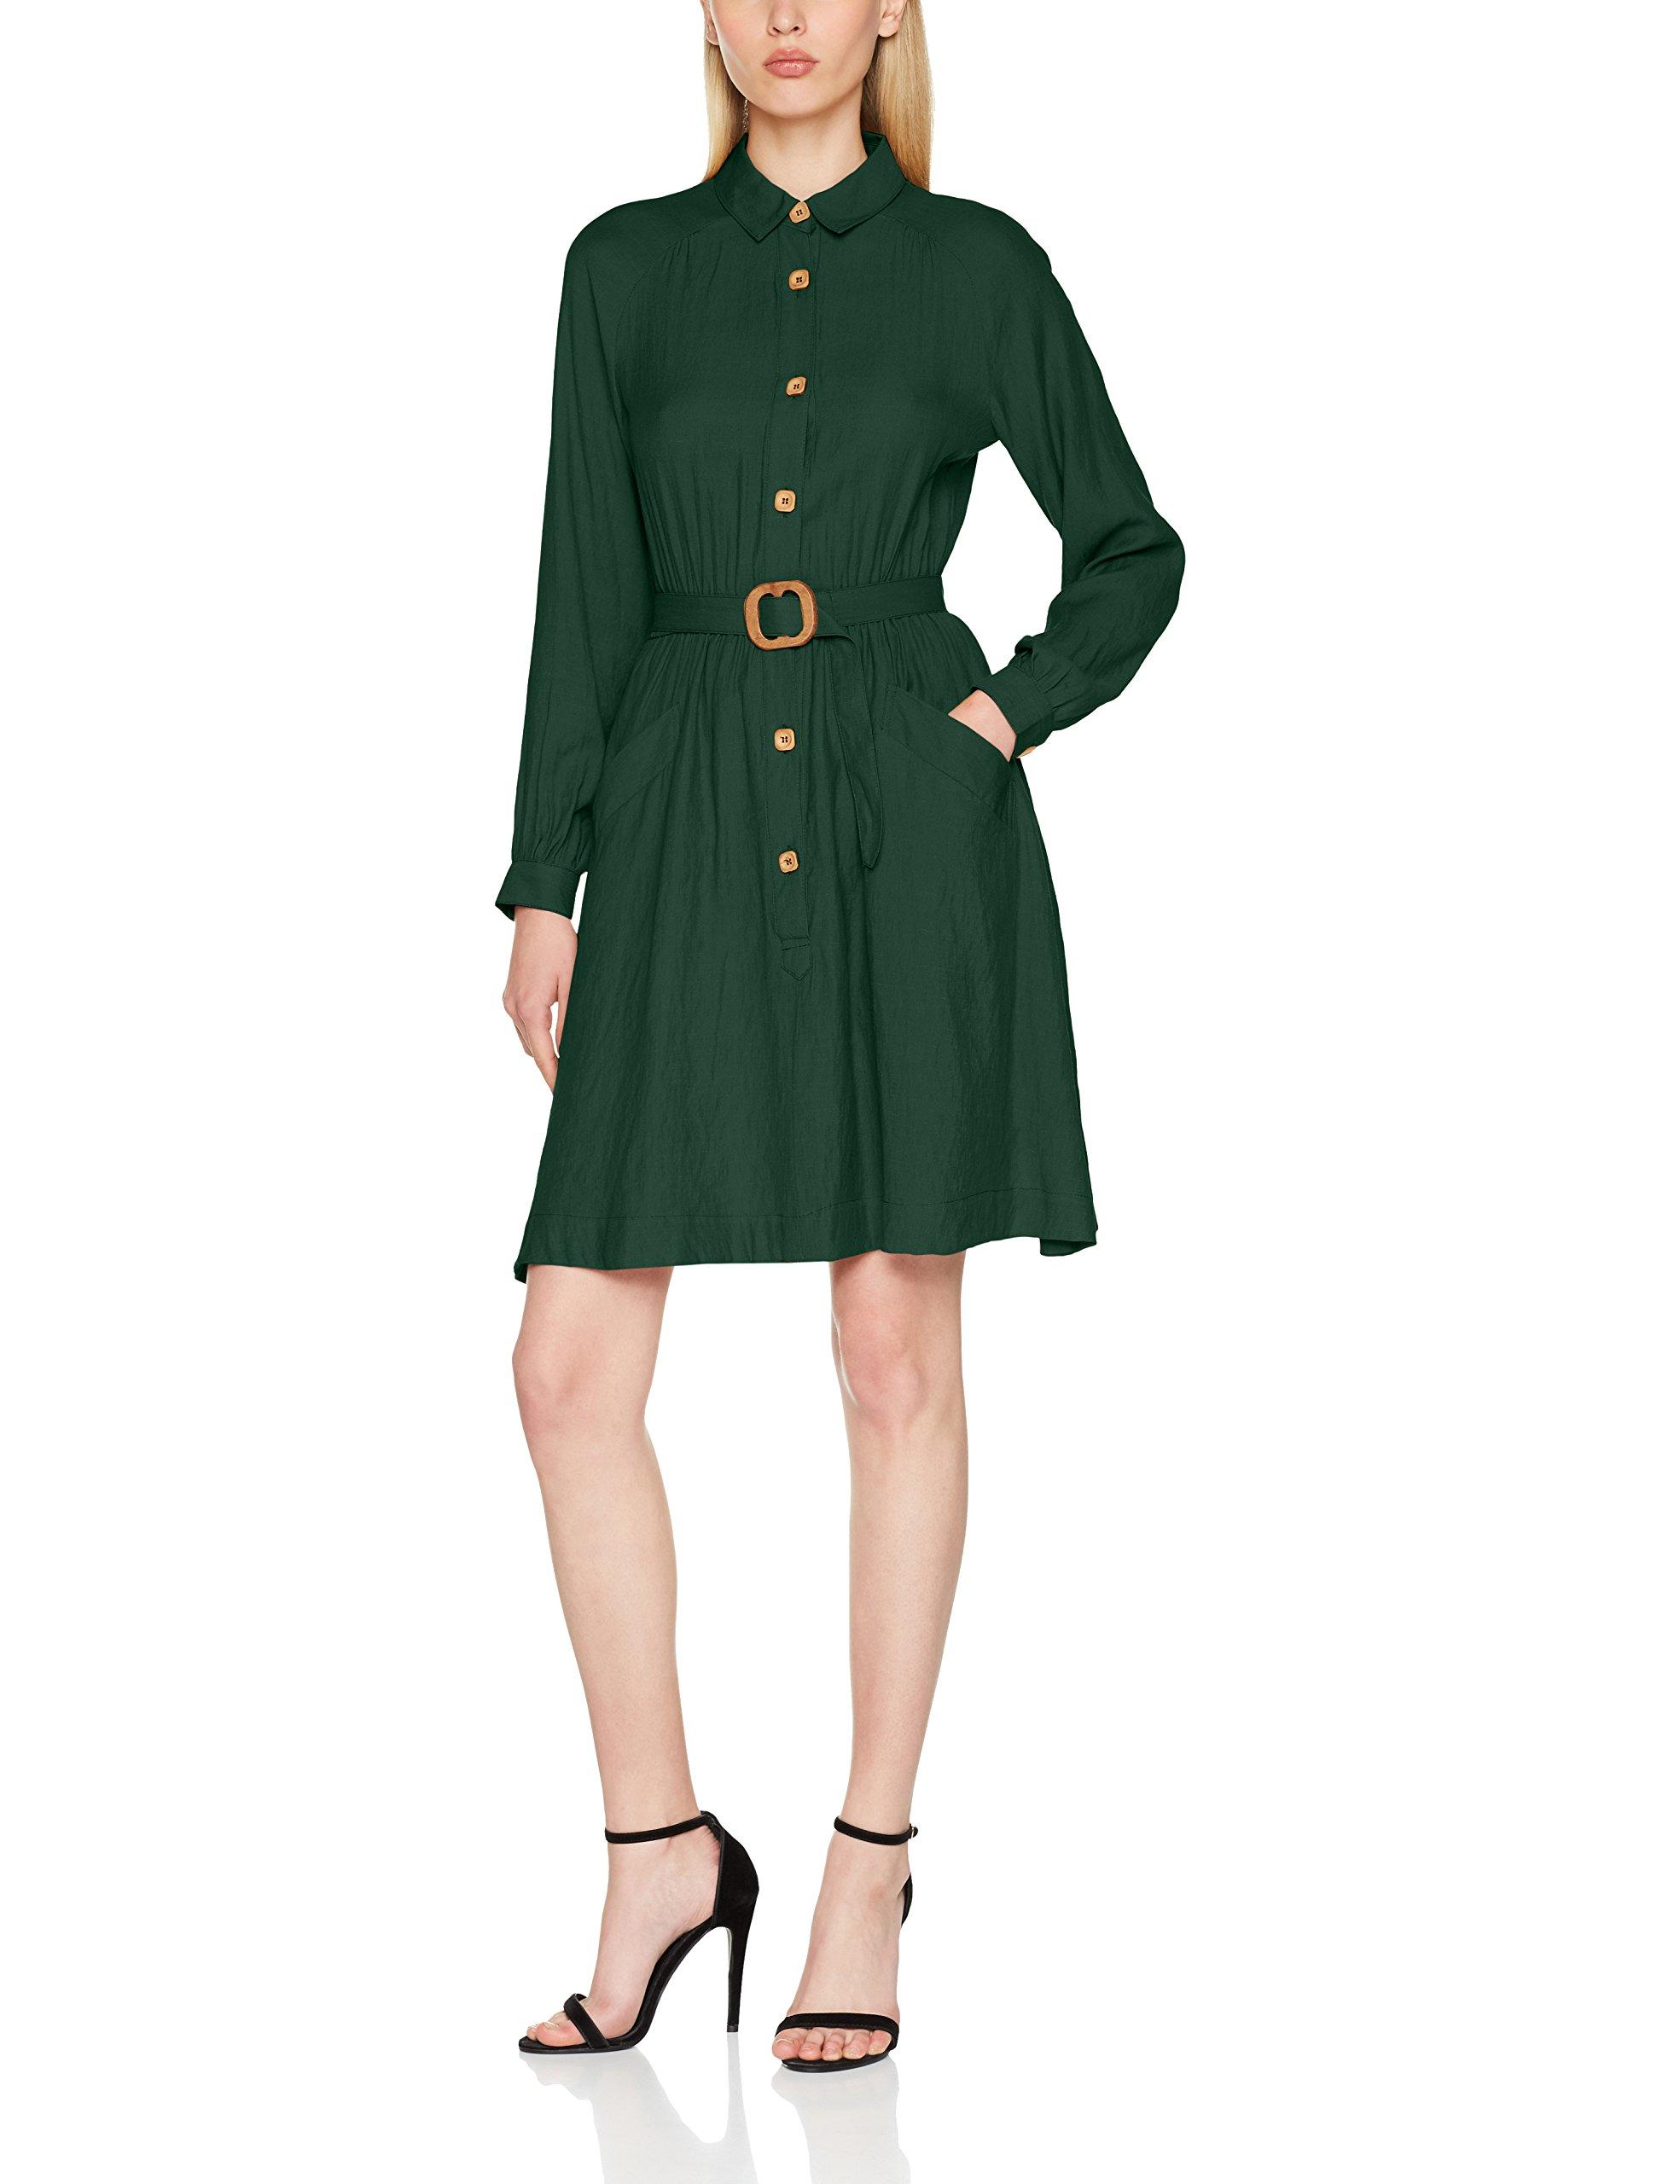 Dress Robe Pepaloves Salma largeFemme Fabricant Green DécontractéeVert 042 taille OPkZiuwXT